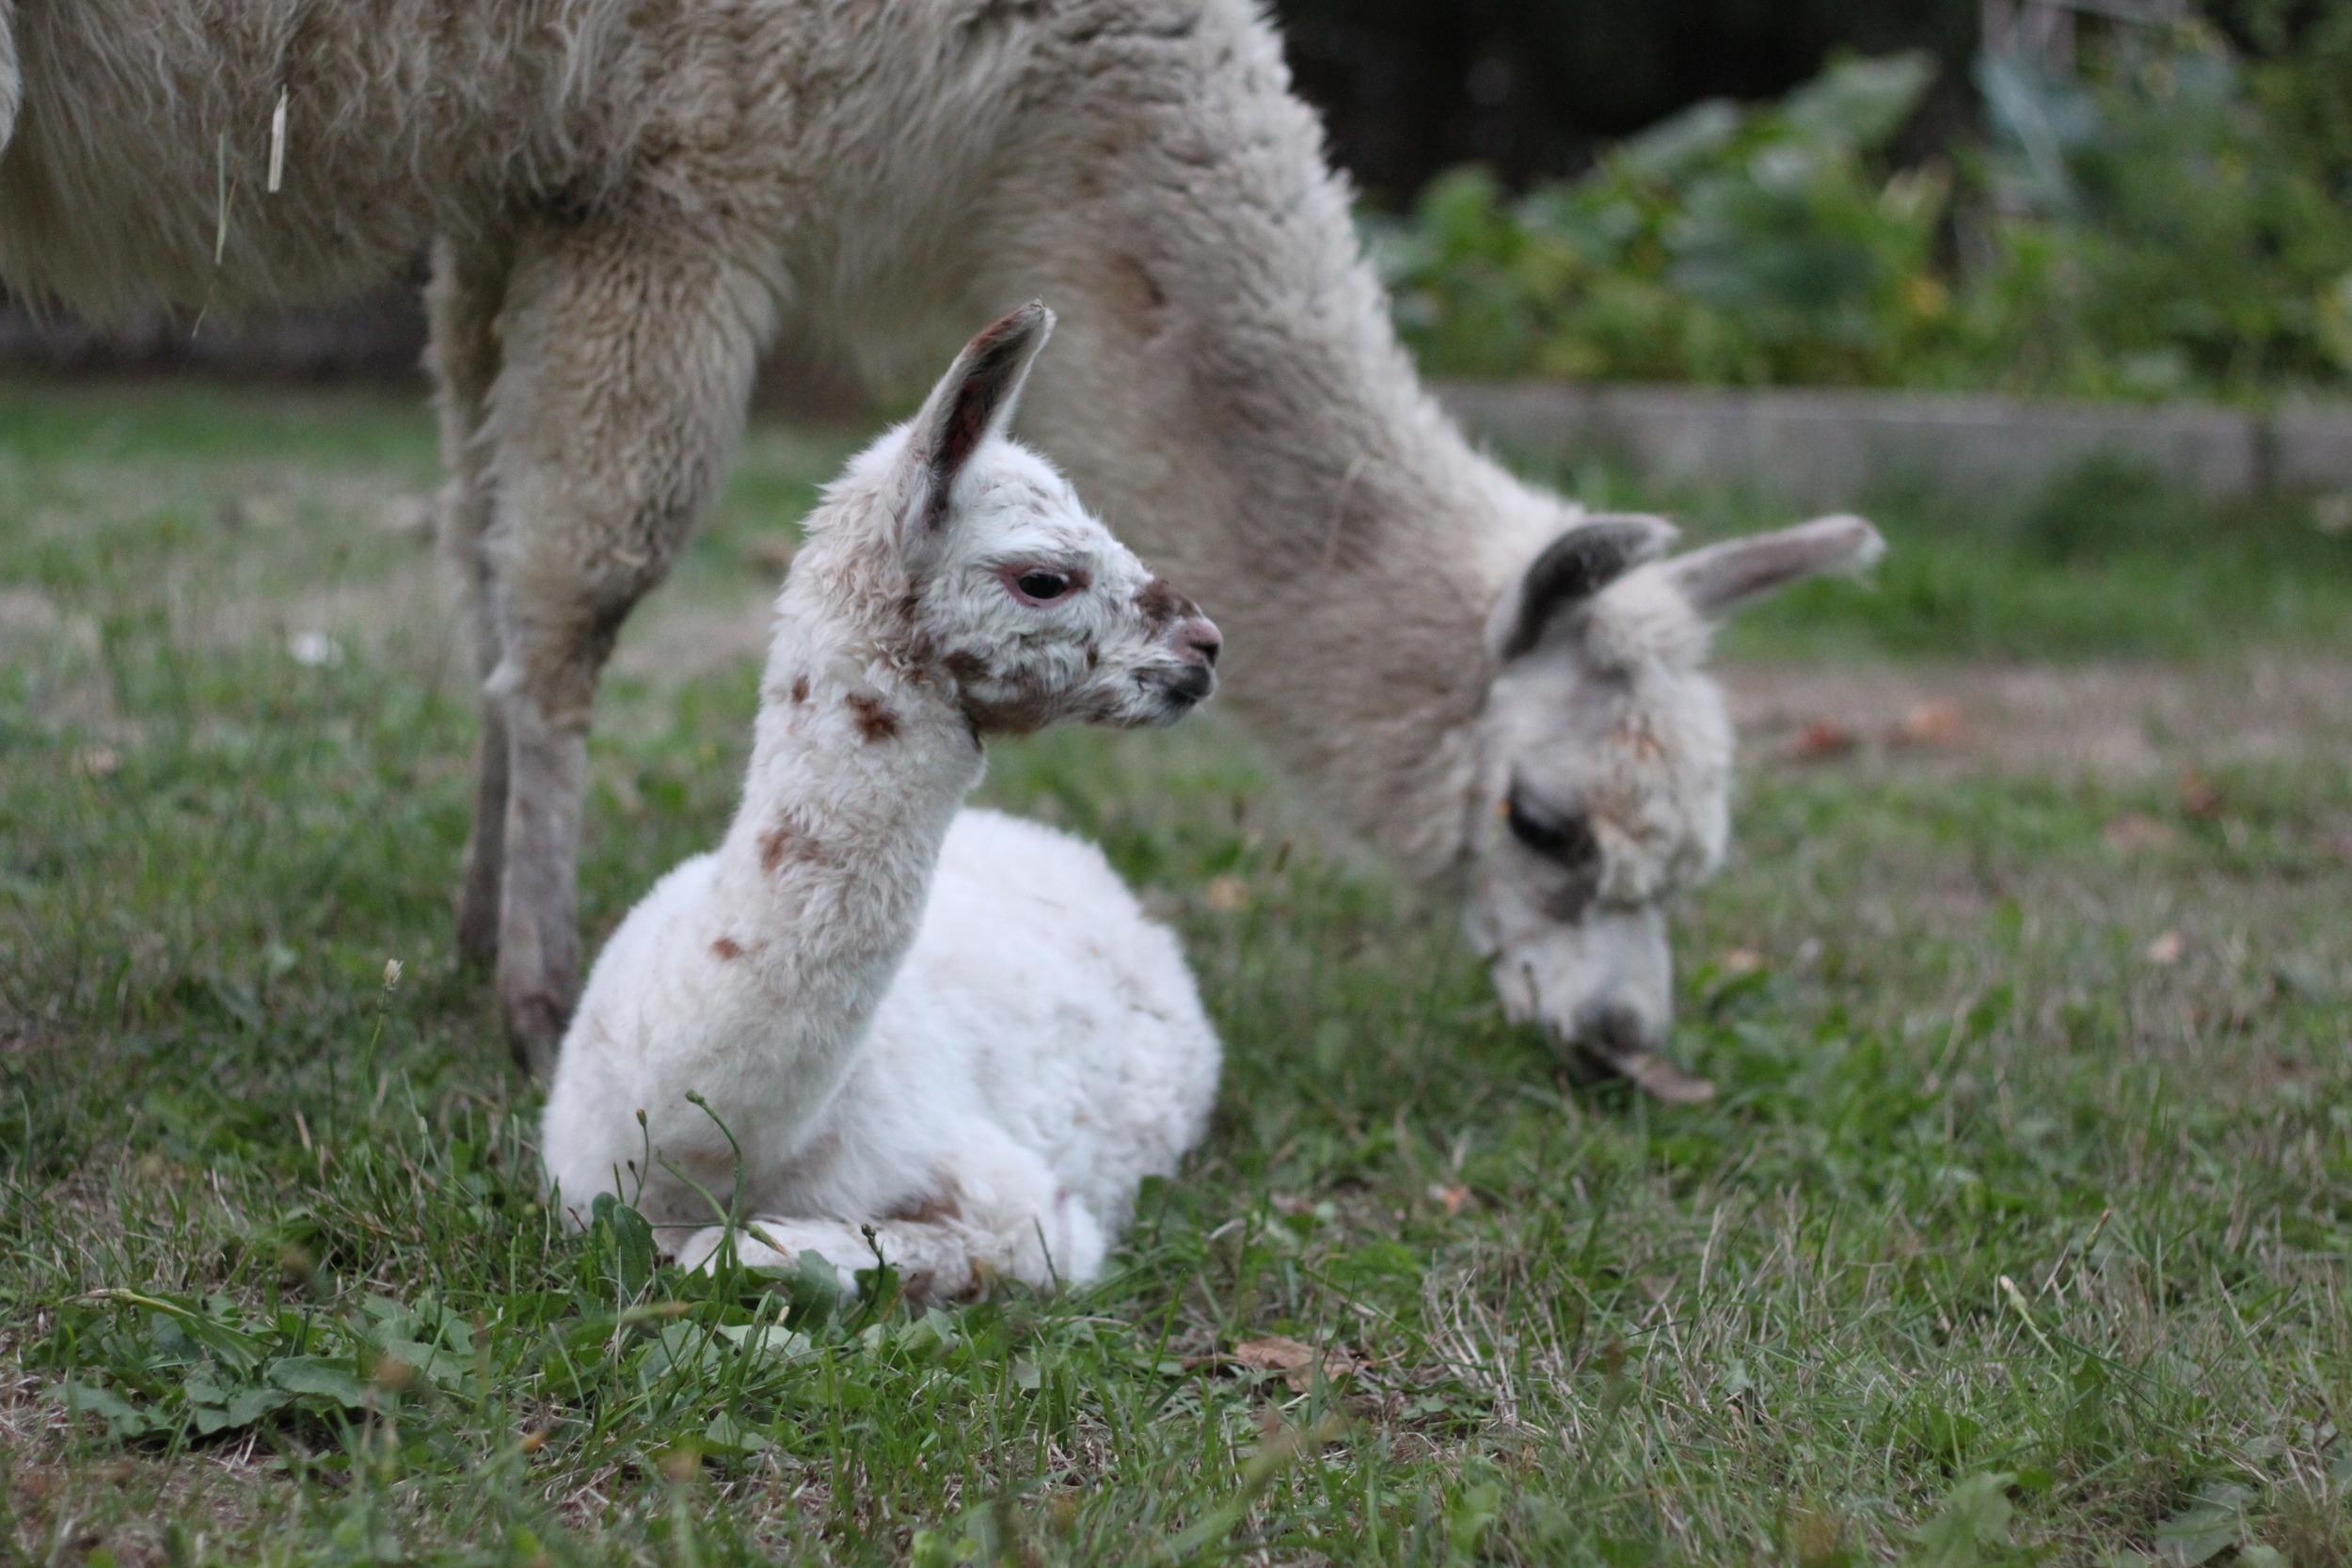 We welcomed baby Dolly Llama (1/4 llama, 3/4) alpaca to the farm in September